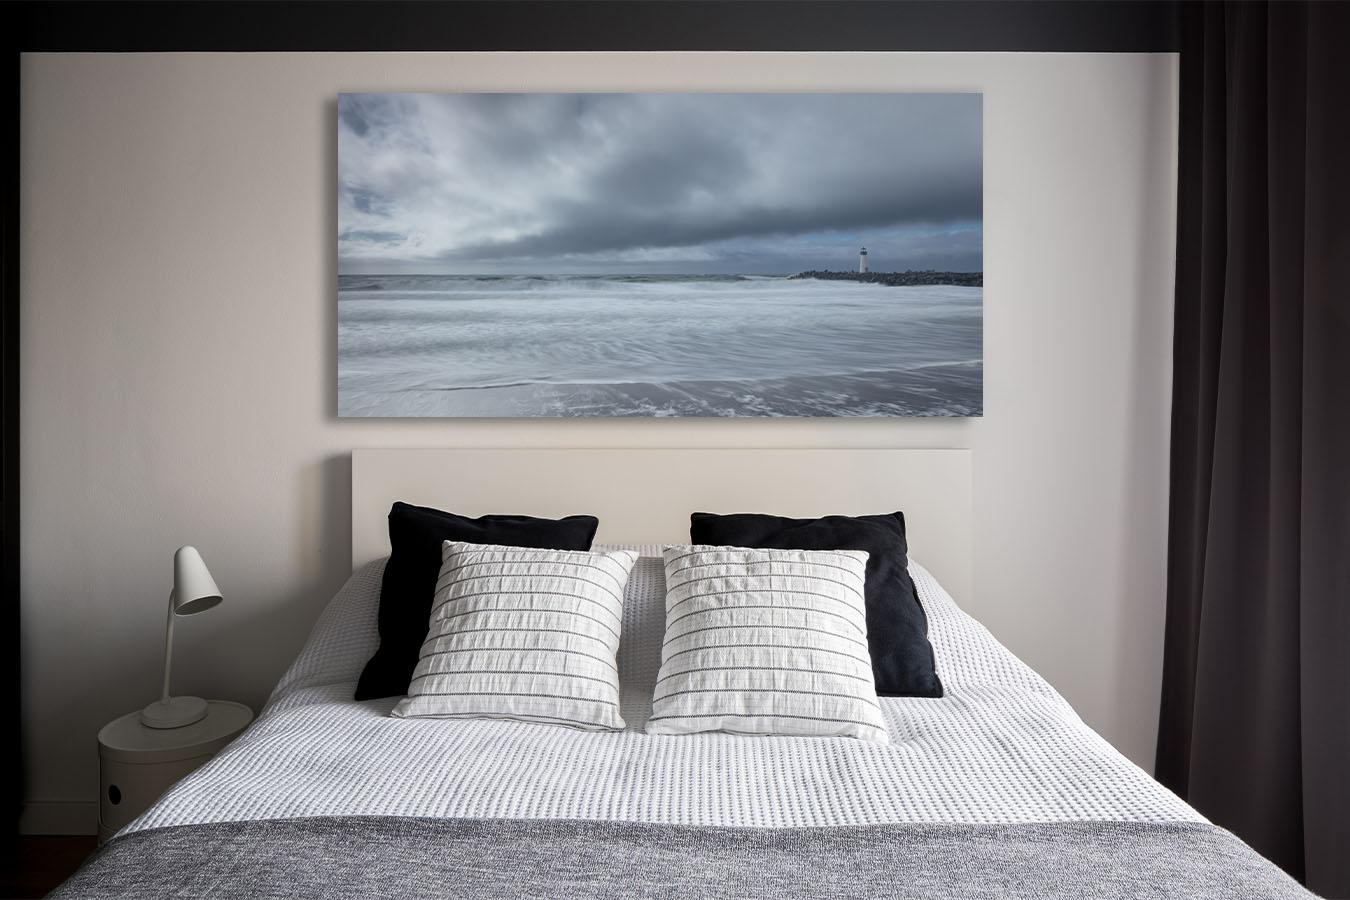 Fine Art Photograpphy home decor artwork California coast seascape ocean beach waves surf lighthouse Michael Andrejkow